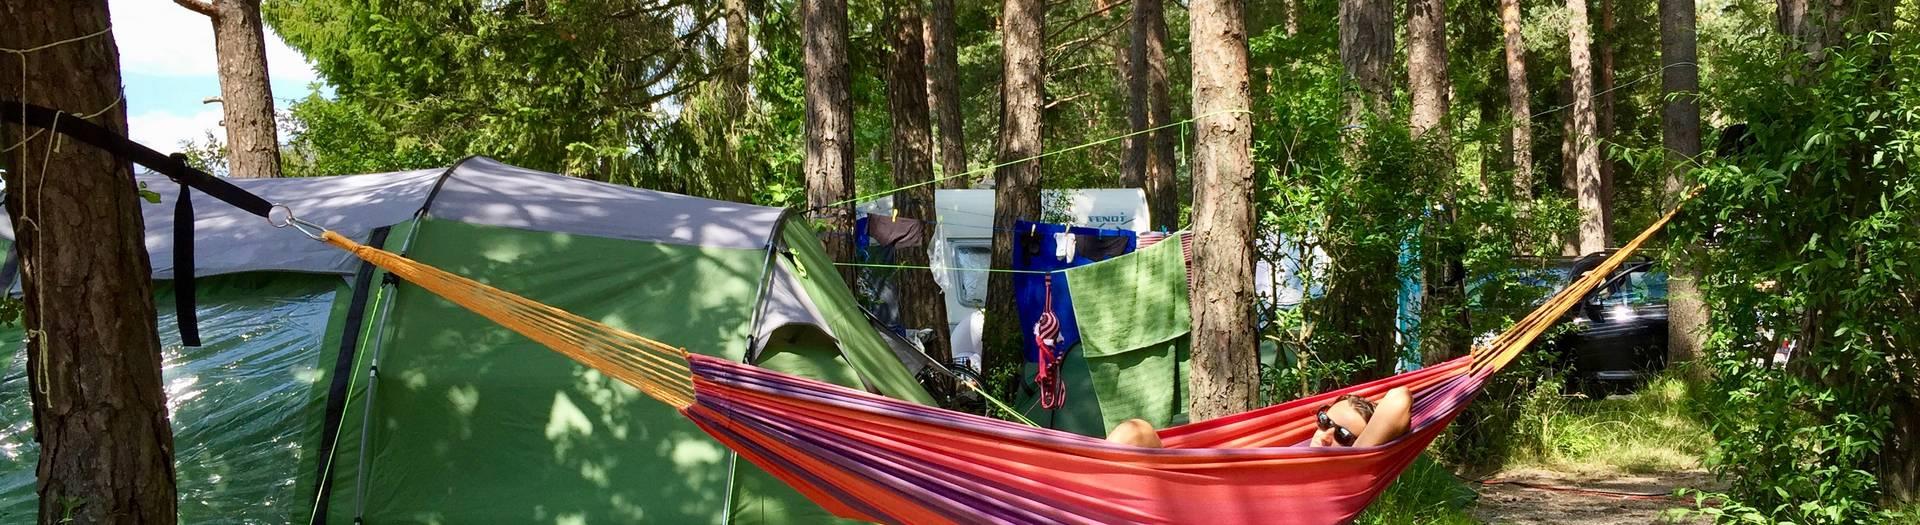 Am Camping Anderwald relaxen